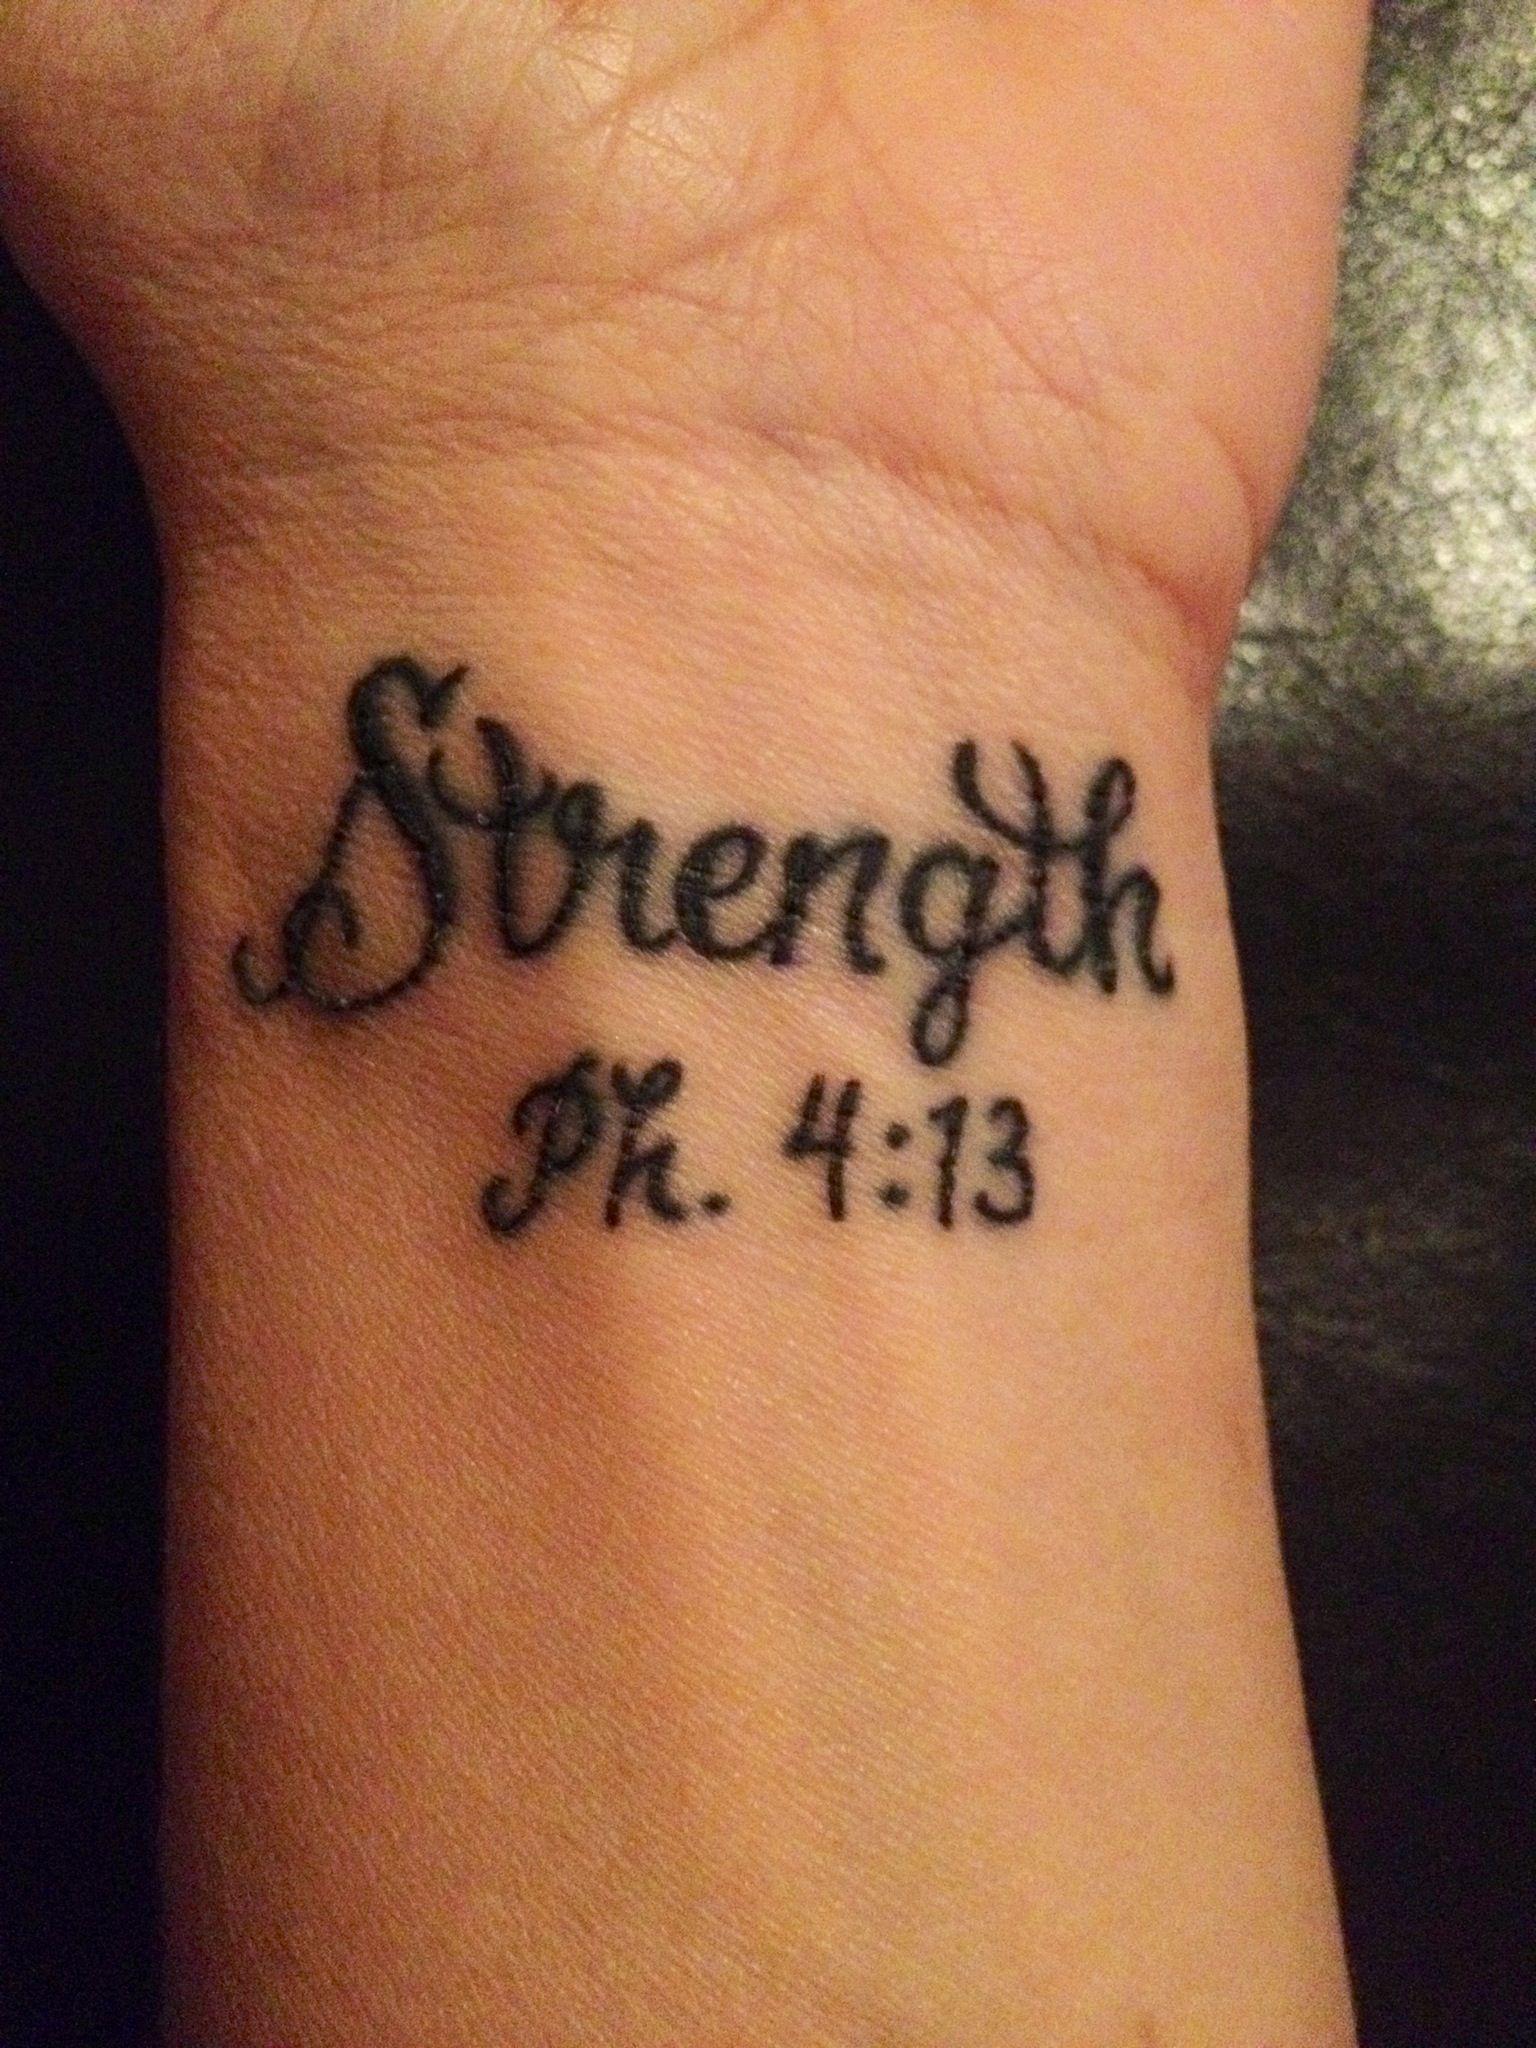 Small christian tattoo ideas for men strength philippians   i n k  pinterest  strength tattoo